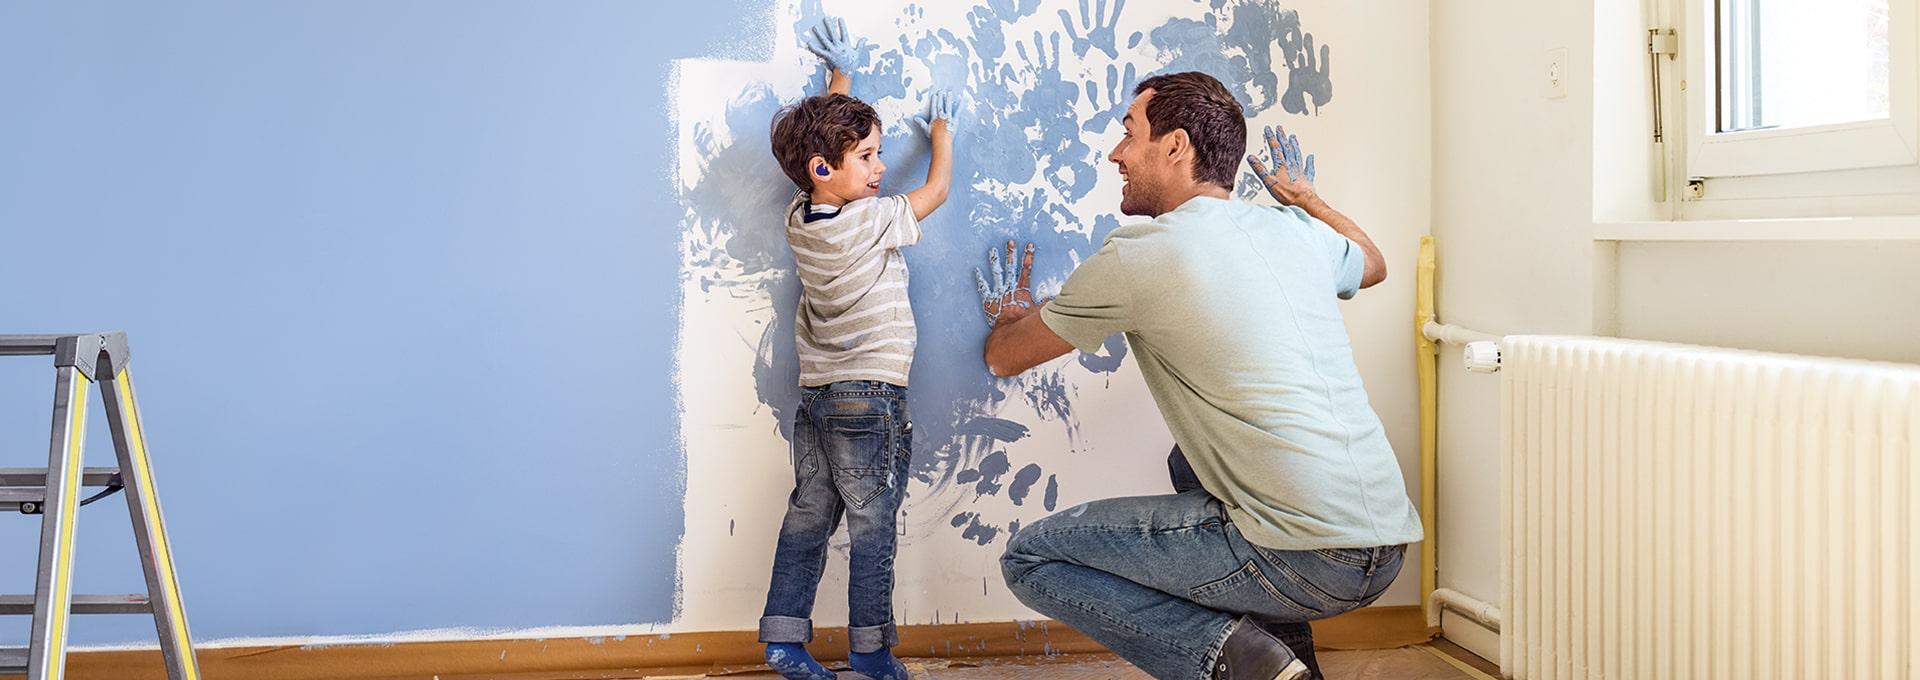 Vater und Sohn mit Bernafon Leox Super Power|Ultra Power Hörgeräten, bemalen eine Wand und fügen spontan Handabdrücke hinzu.